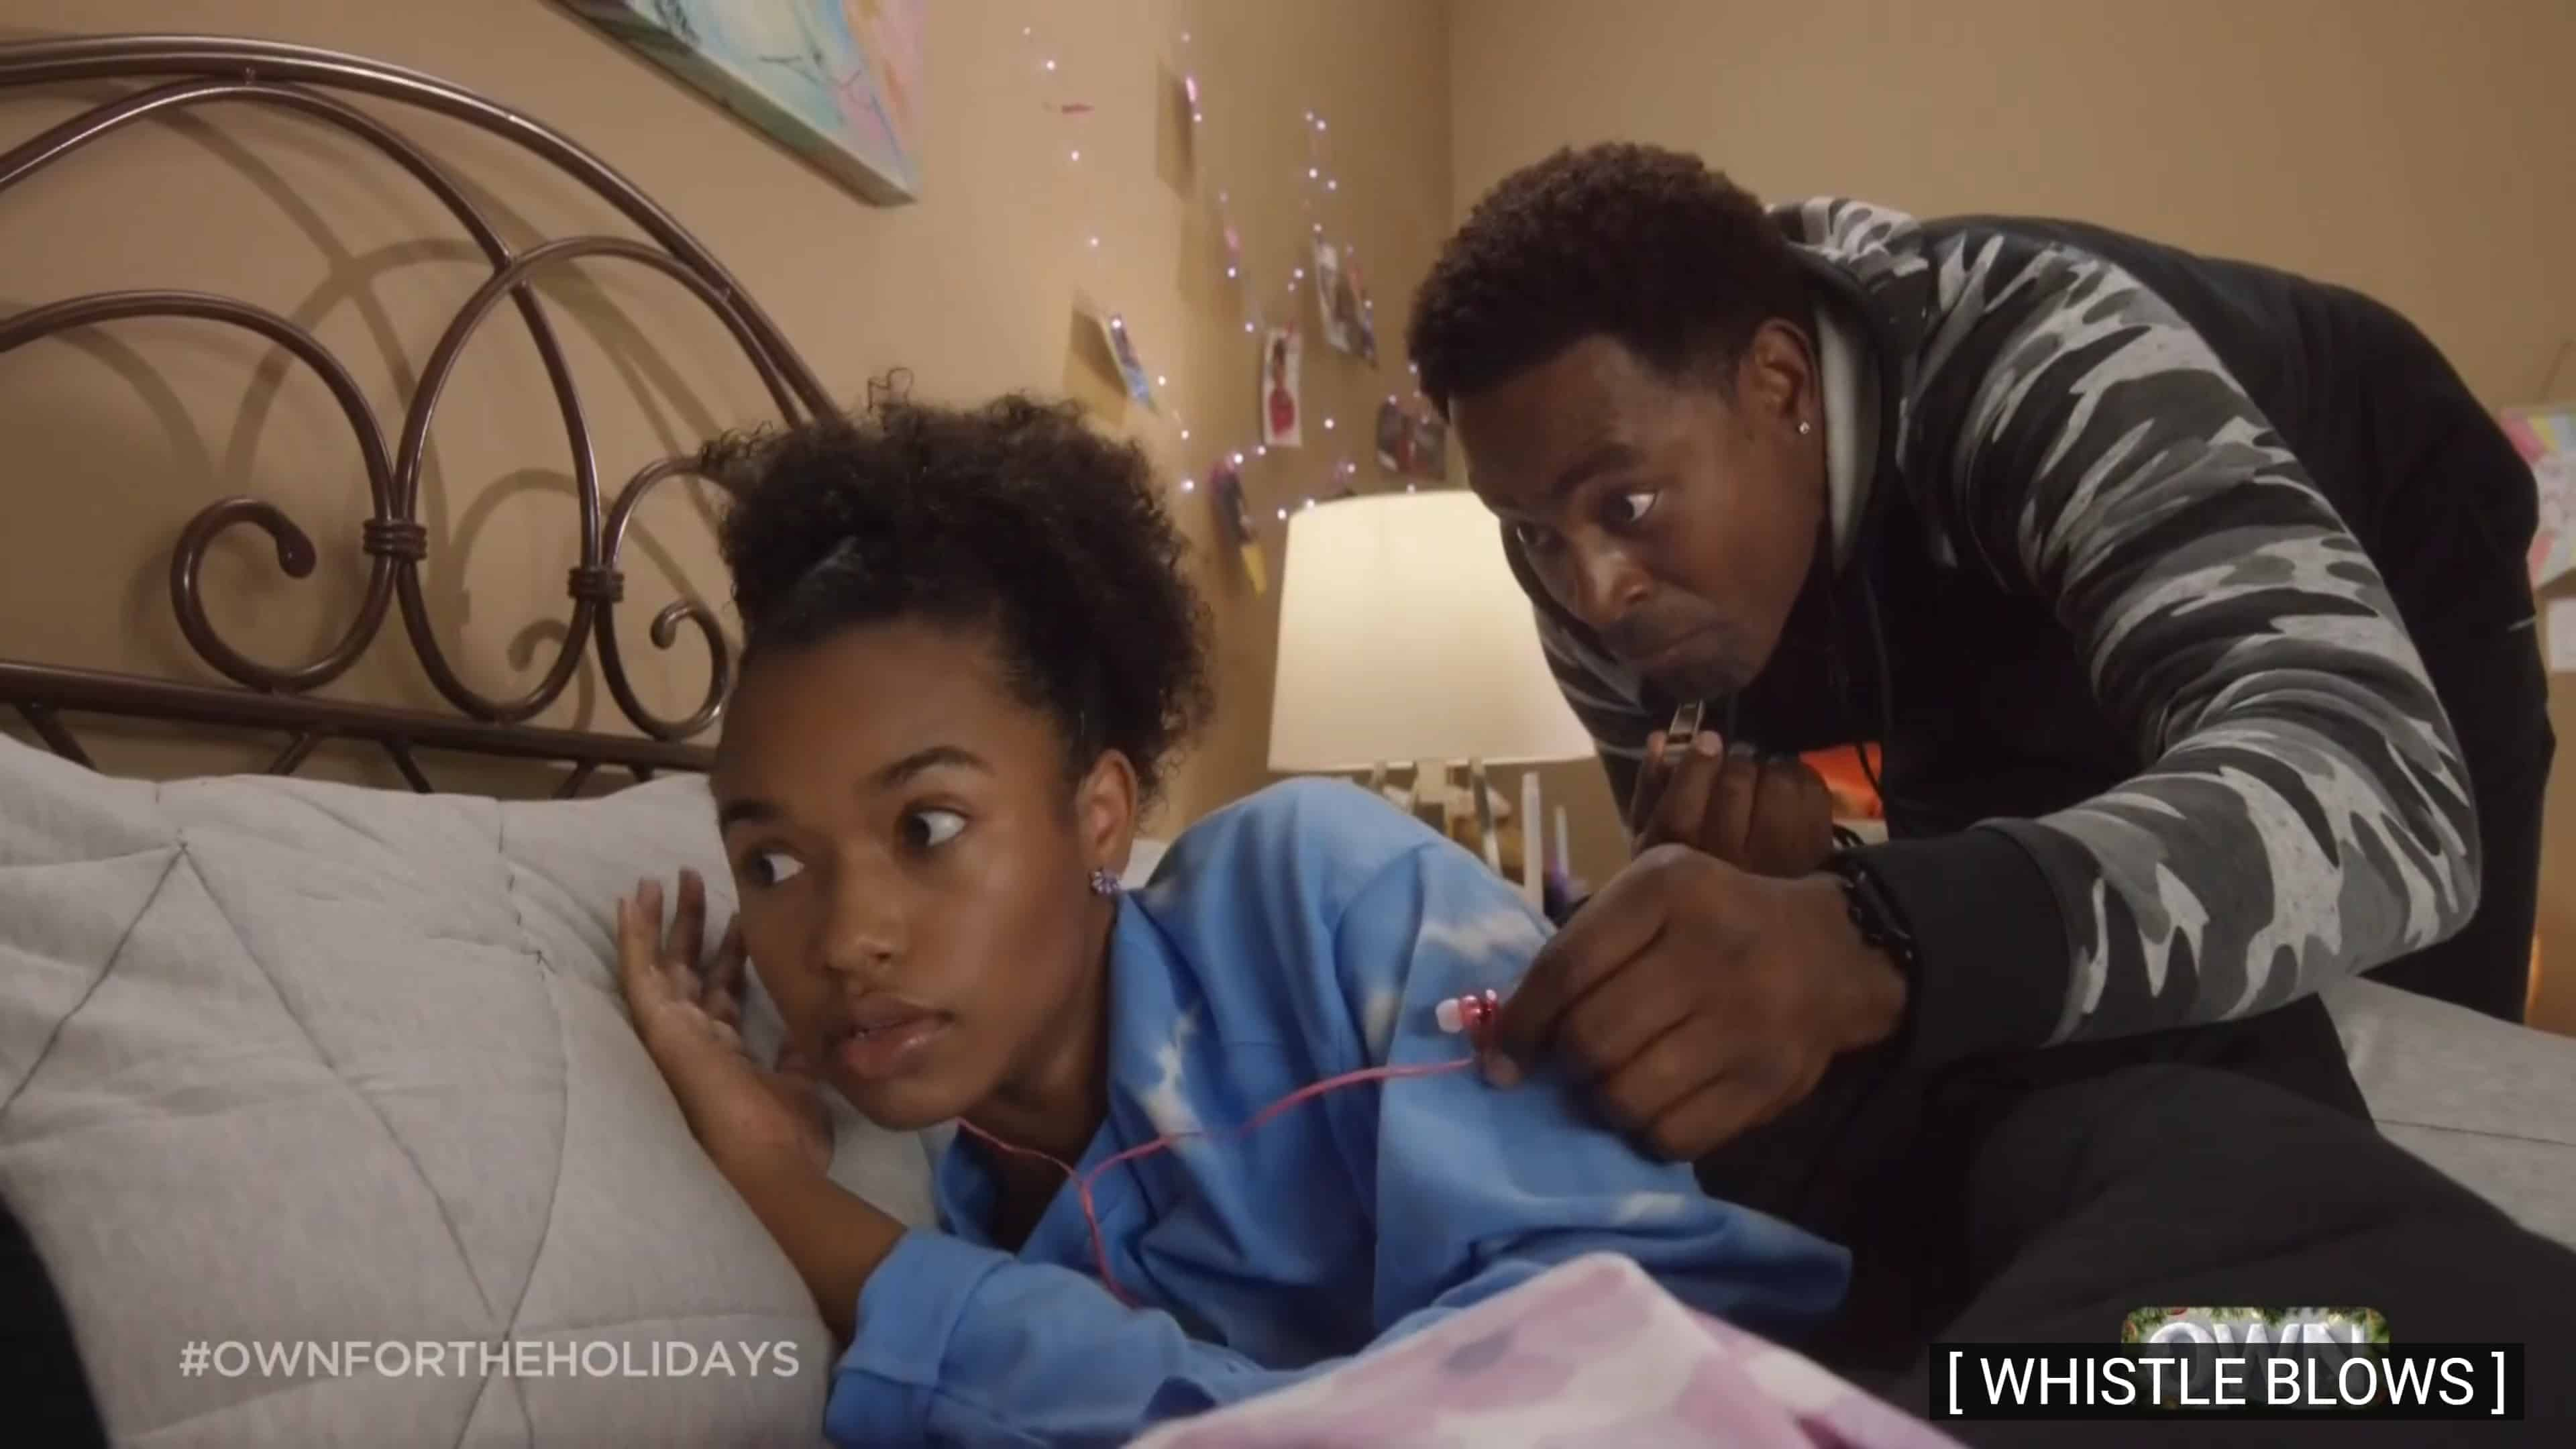 Vanessa (Baily H. Tippen) and Donovan when Donovan woke her up